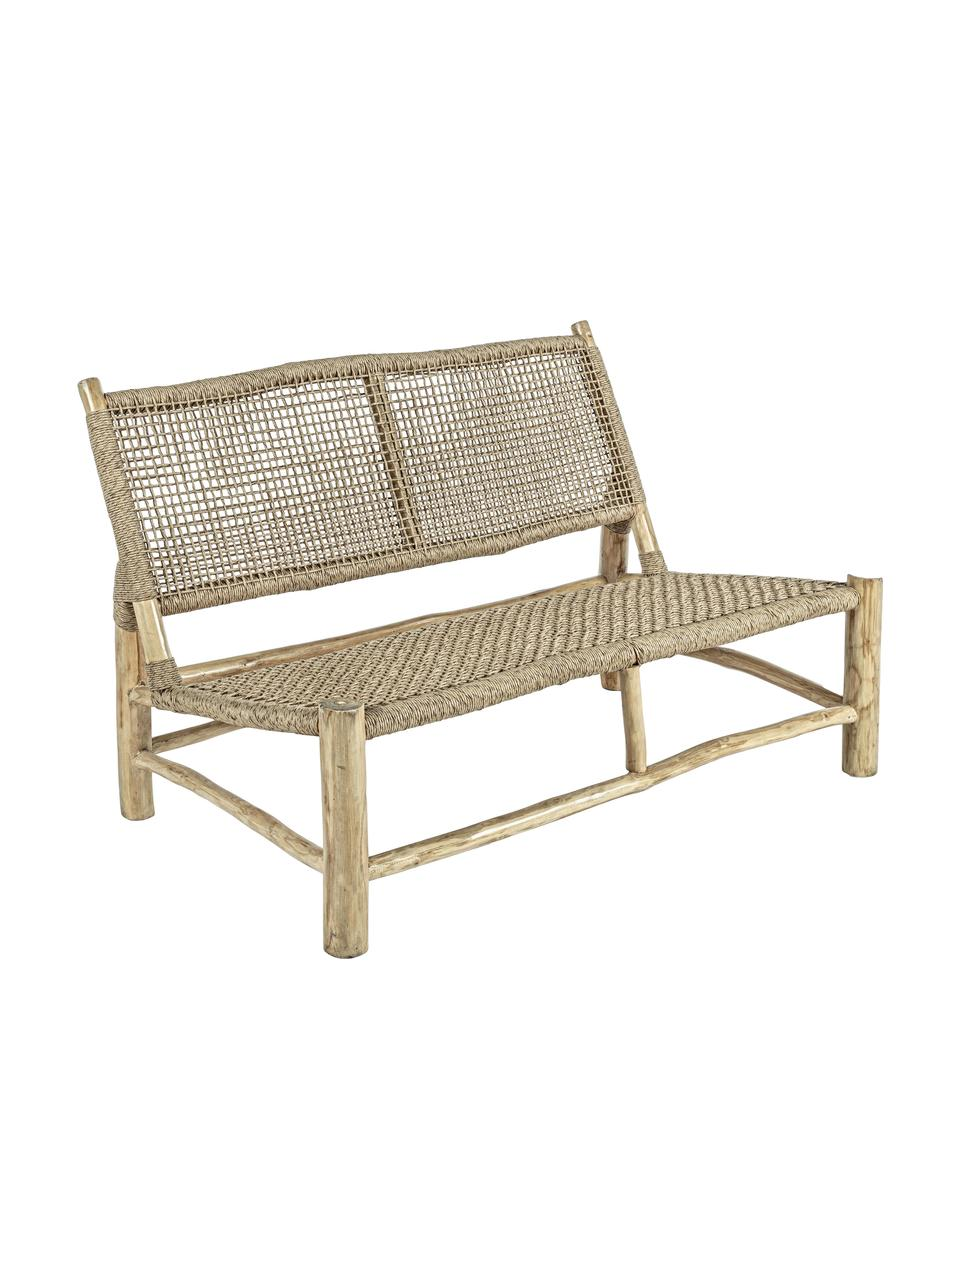 Lounge-Gartensofa Lampok (2-Sitzer), Gestell: Teakholz, Beige, 120 x 79 cm